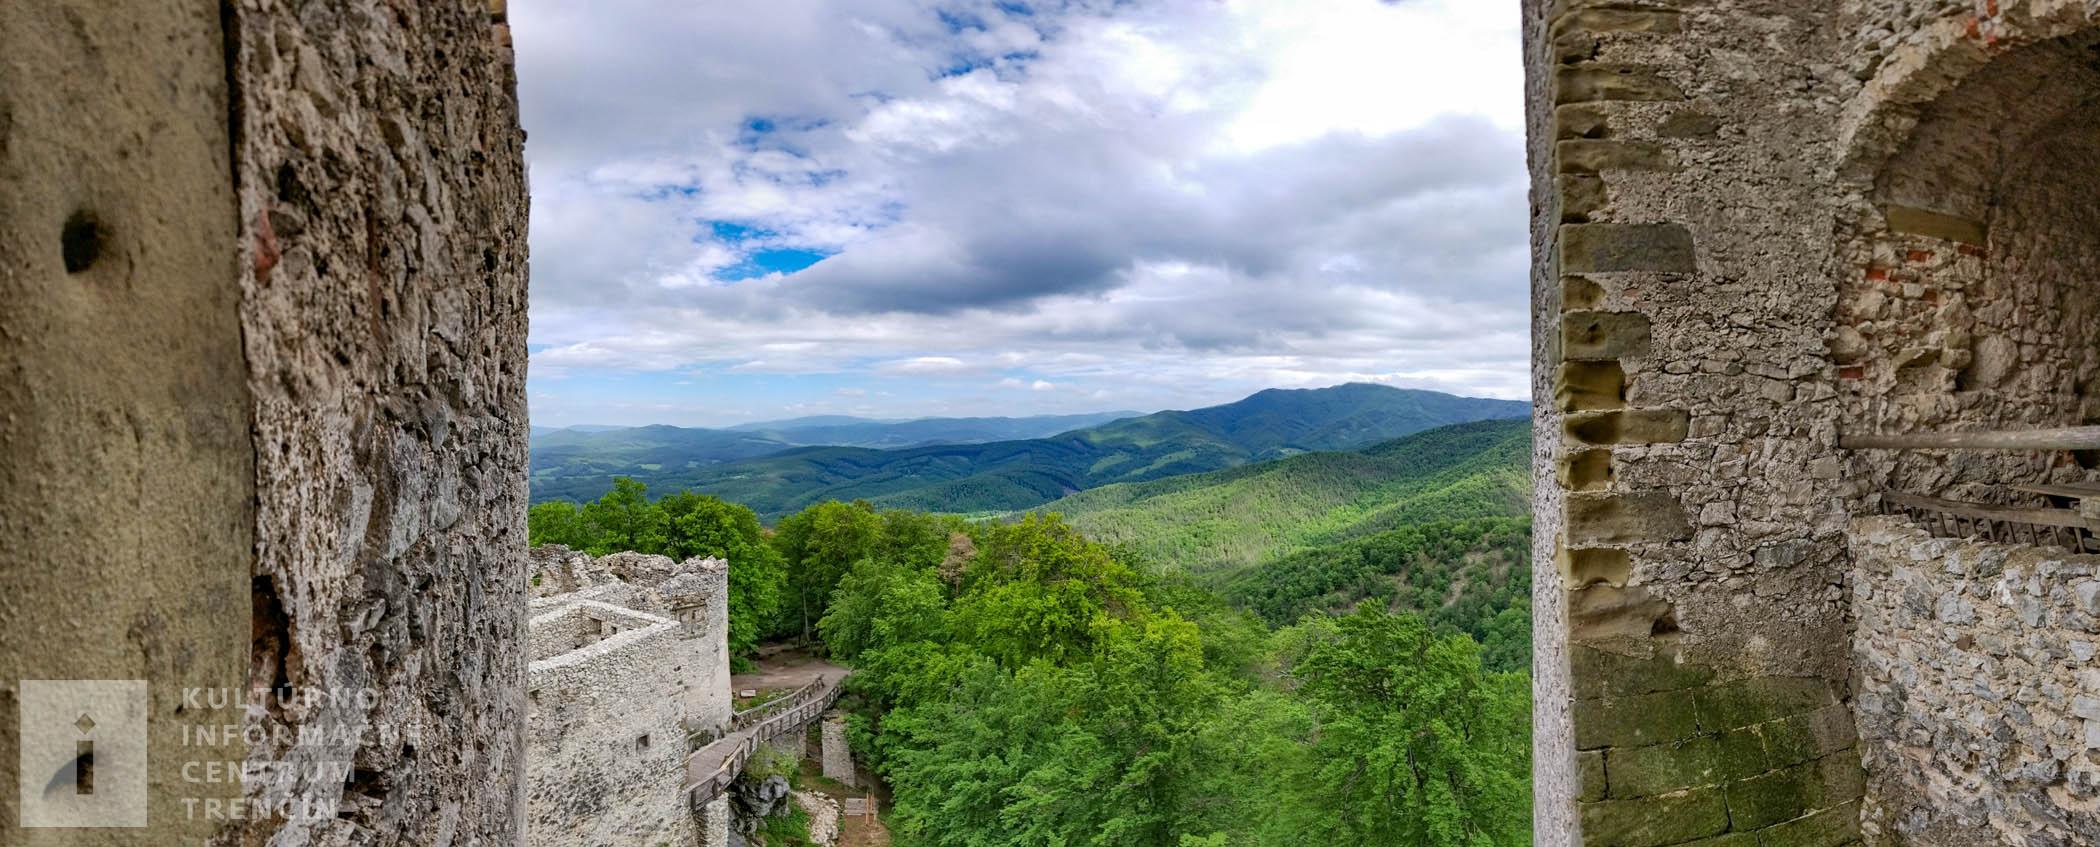 Pohľad z hradu Uhrovec/View from Castle Uhrovec